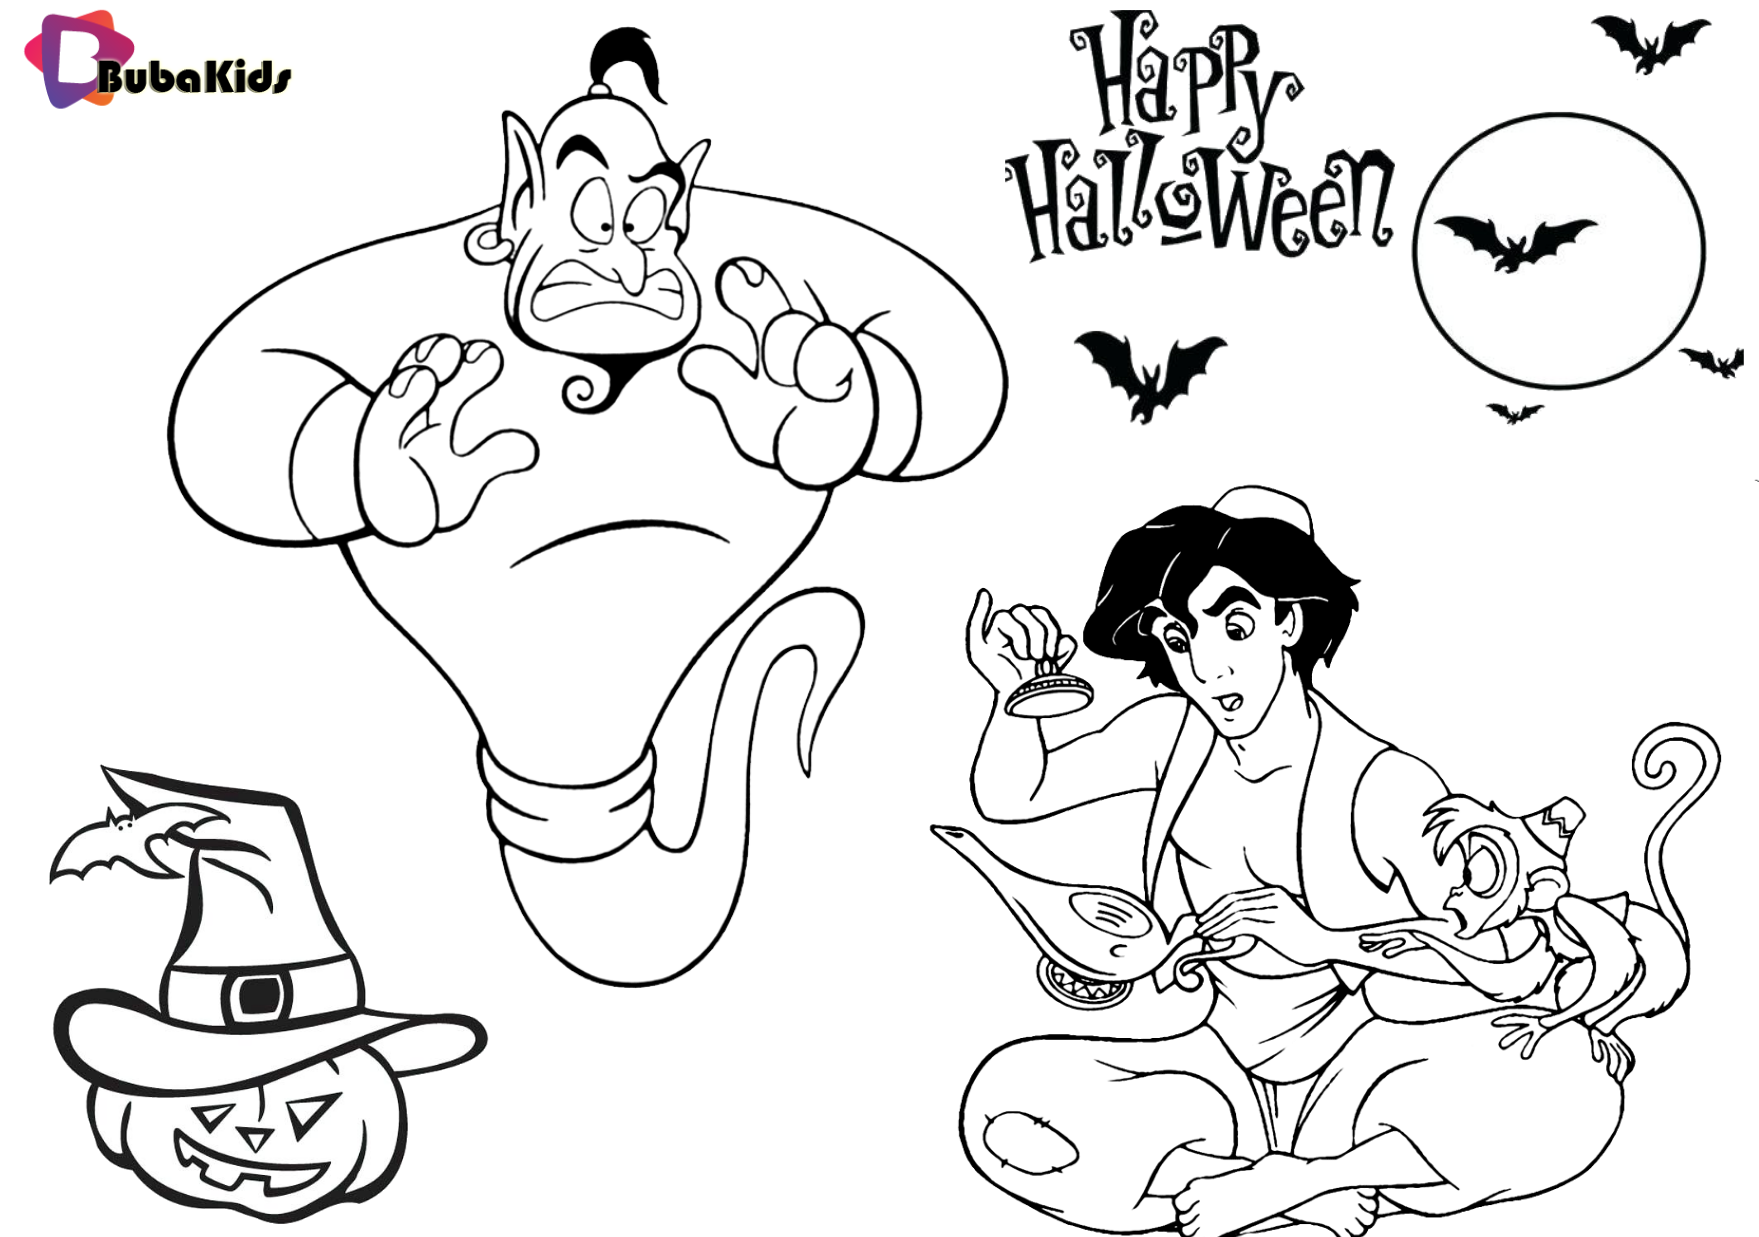 Aladdin Genie And Abu Halloween 2019 Costume Ideas Coloring Page Abu Aladdin Bubakids Com Genie Hal Cartoon Coloring Pages Coloring Pages Halloween 2019